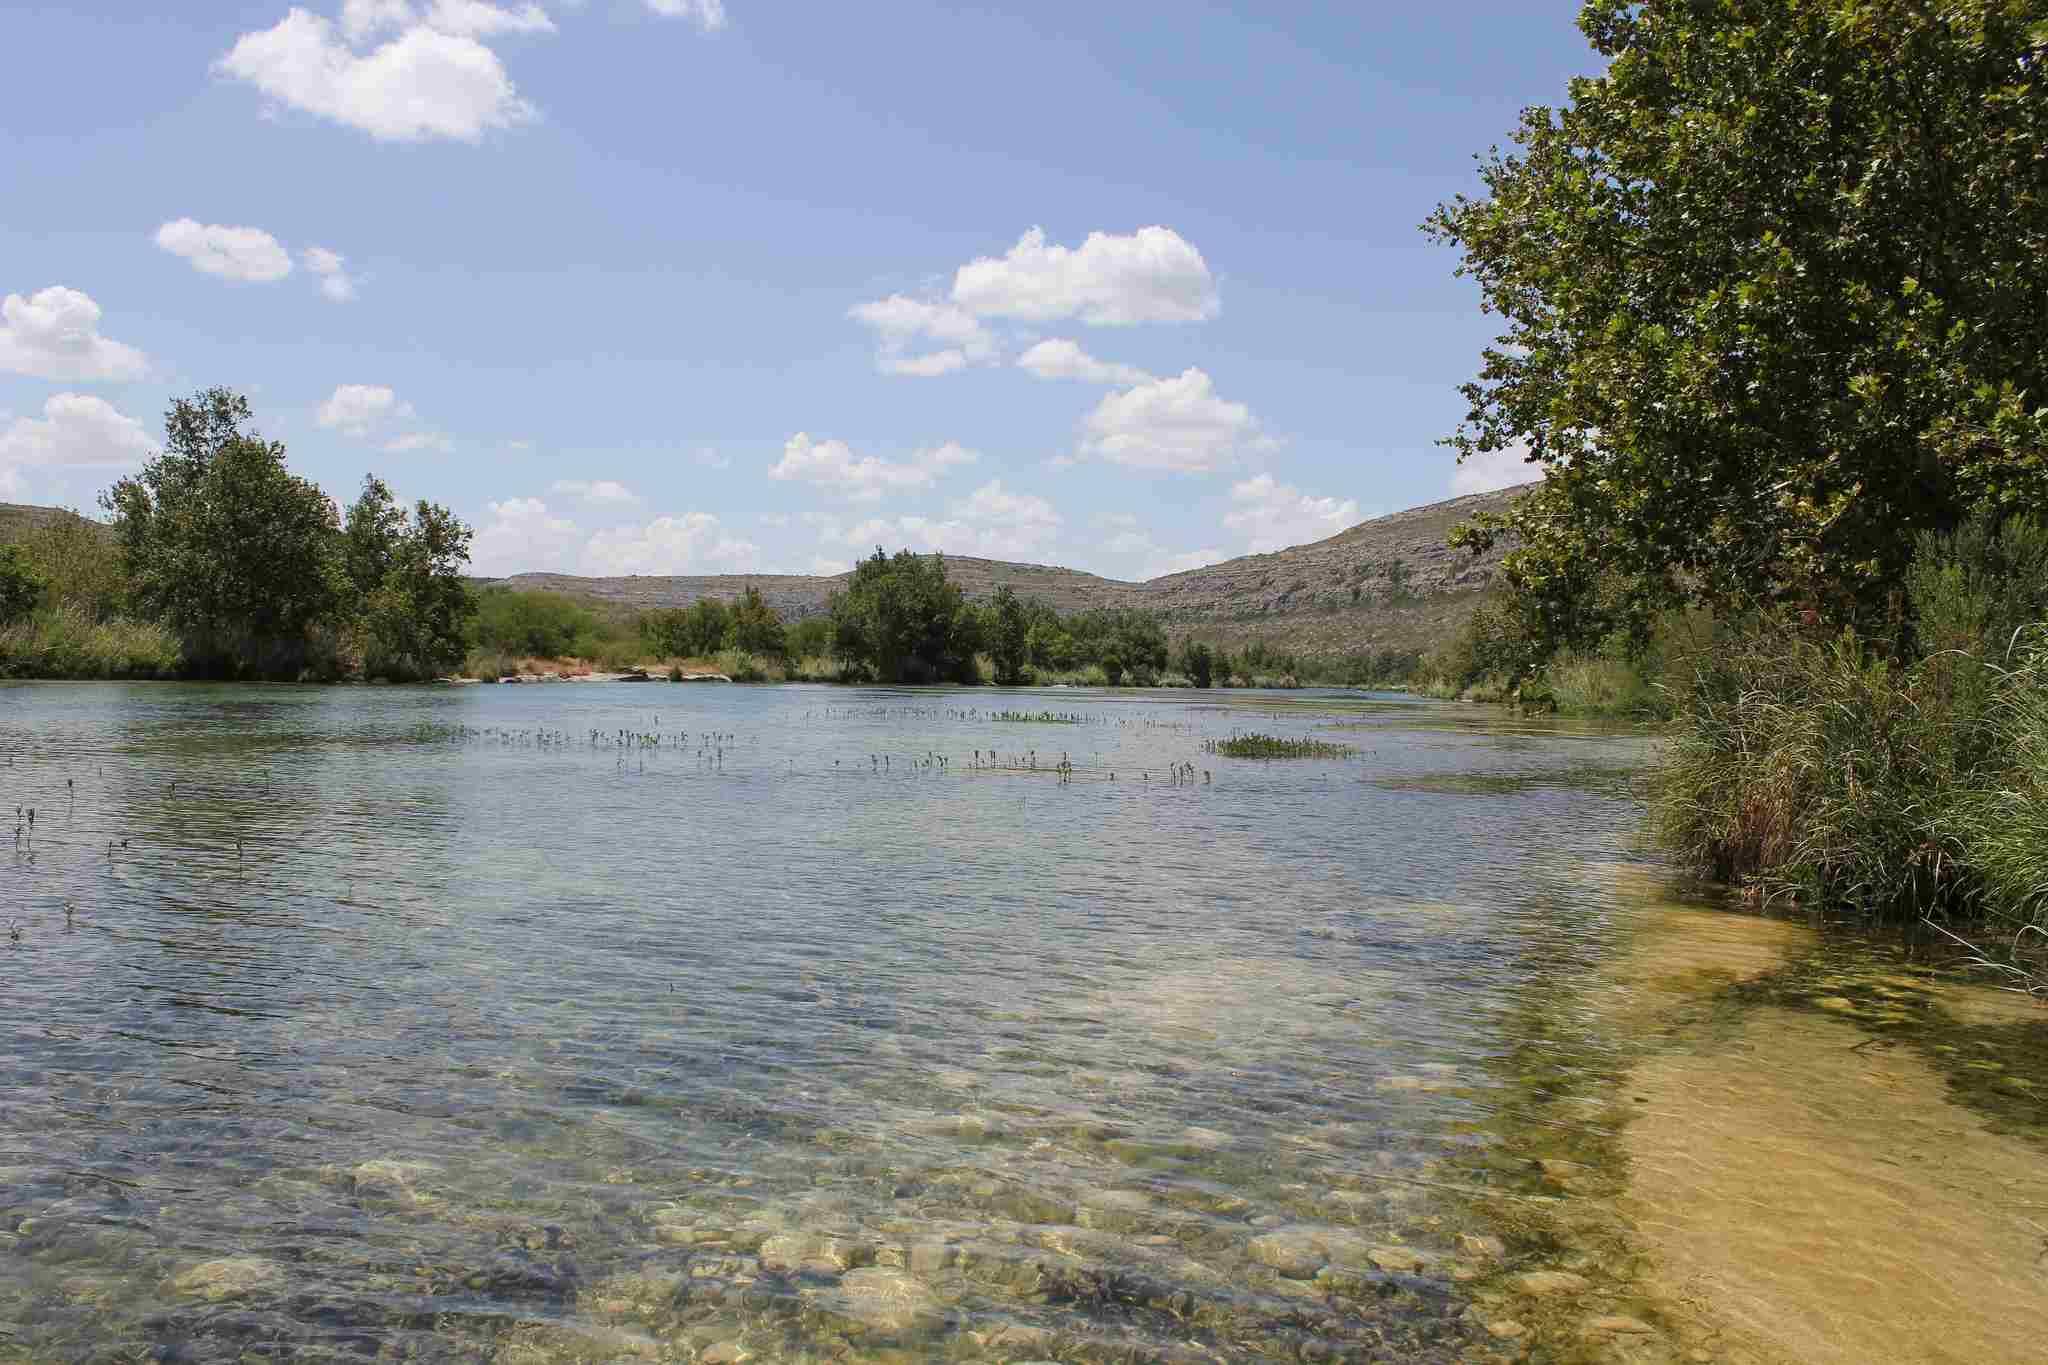 Devils River 2, Val Verde County, Texas